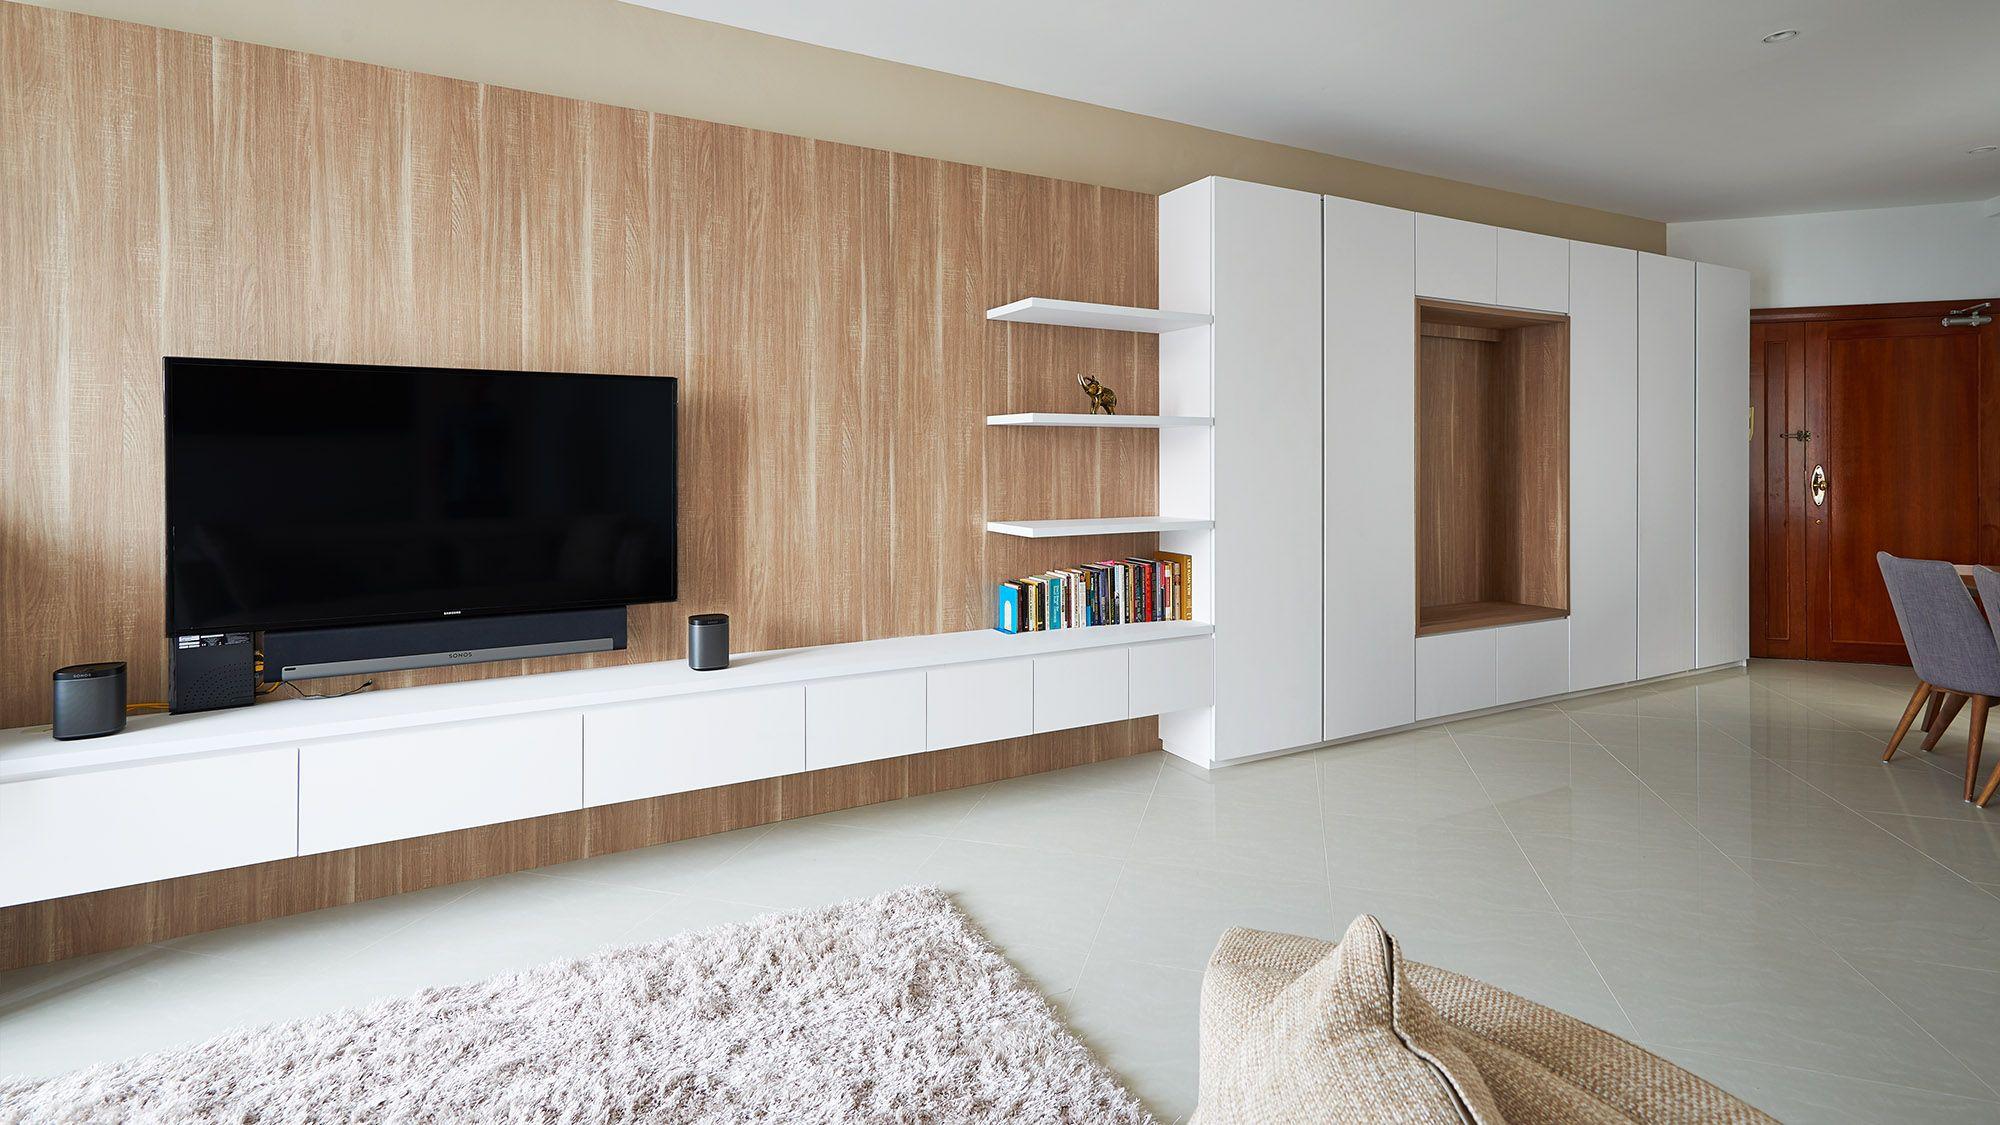 Bayshore modern contemporary home decor singapore for Feature wall ideas living room tv